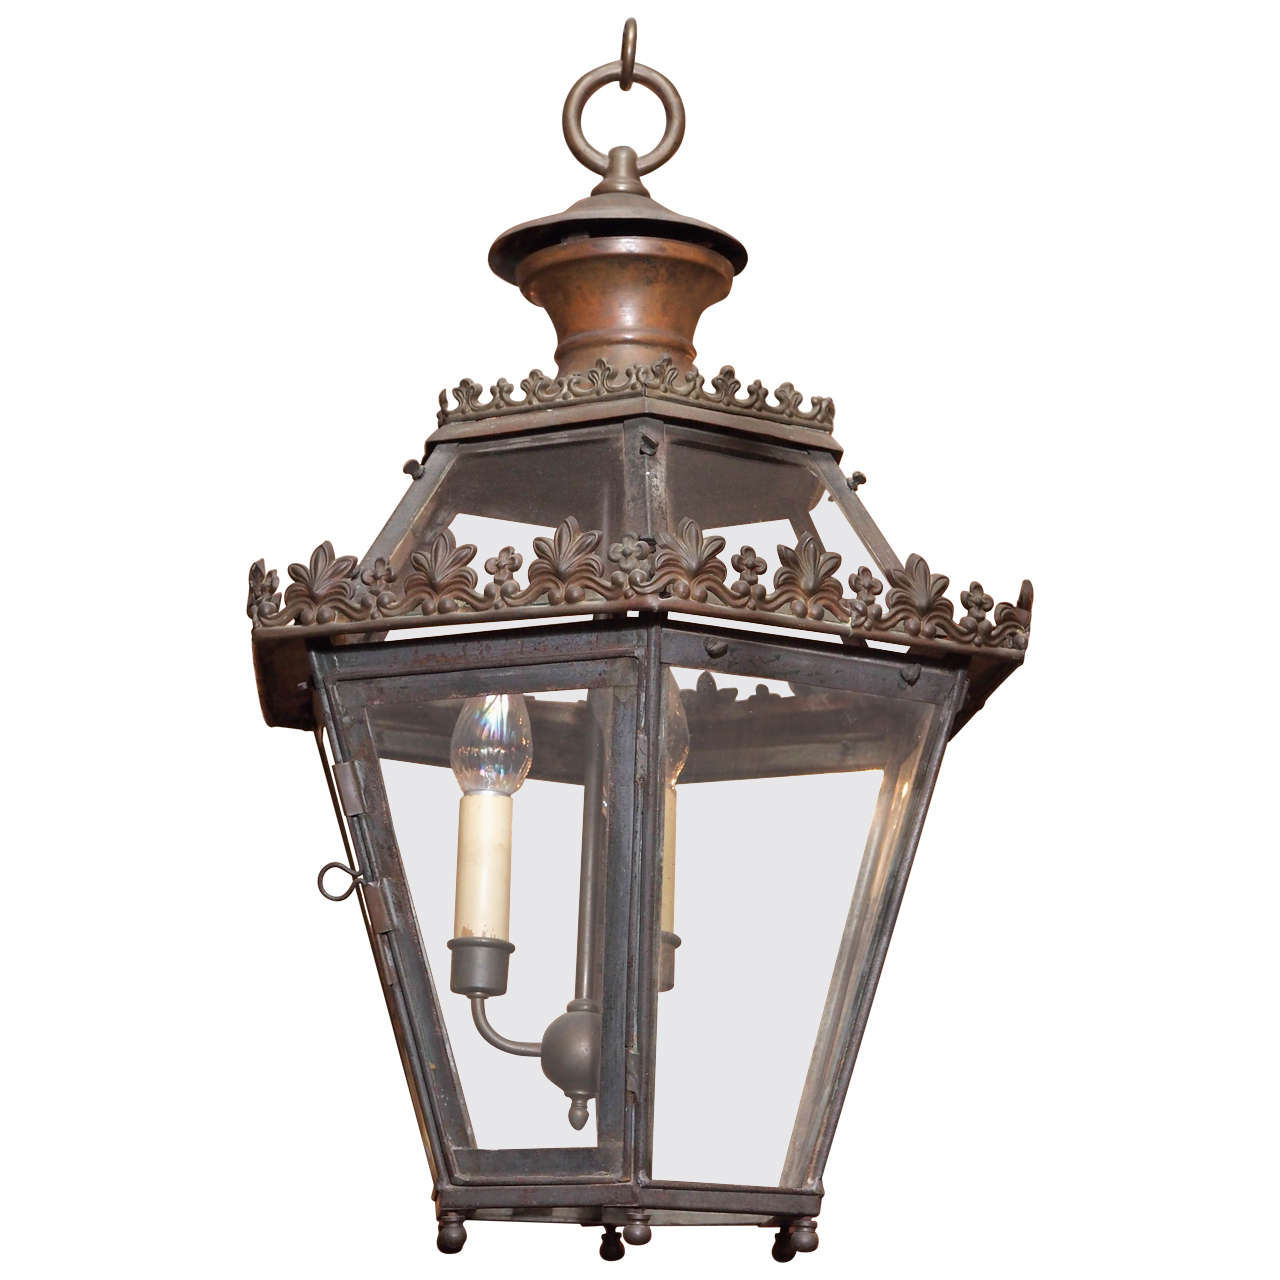 Antique French Iron Lantern At 1stdibs